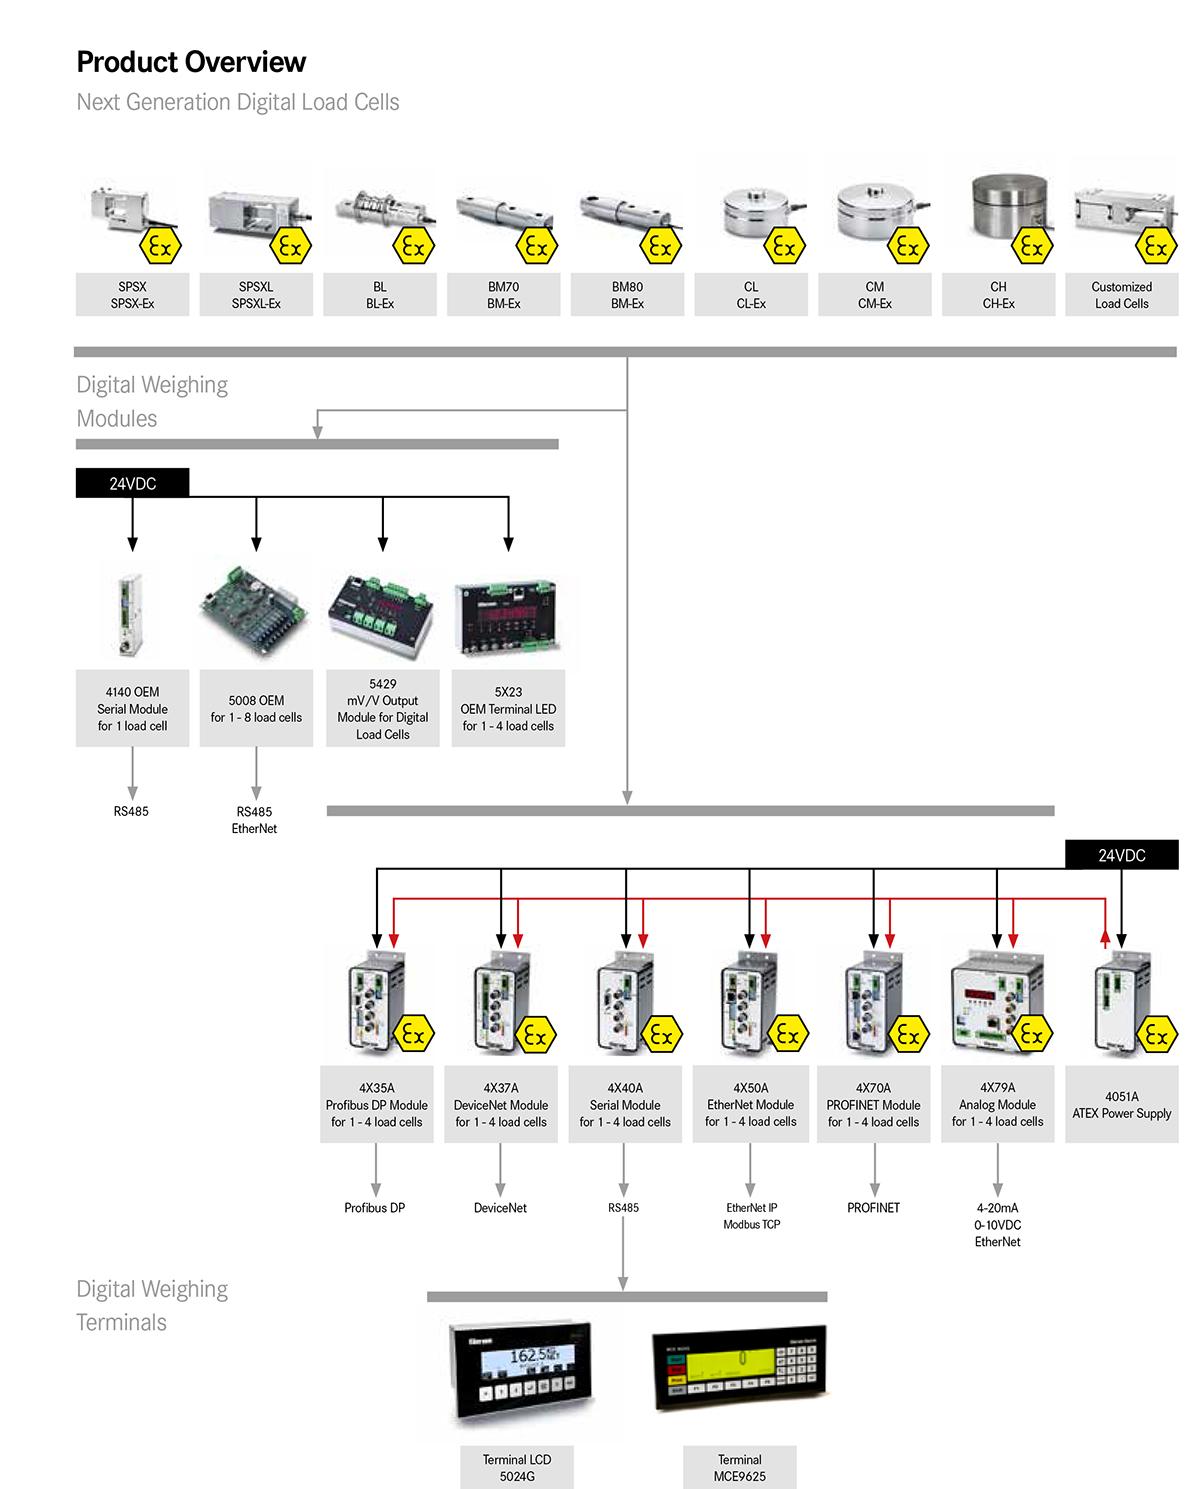 Eilersen - Next Generation Digital Load Cells 2017-2 UK-14